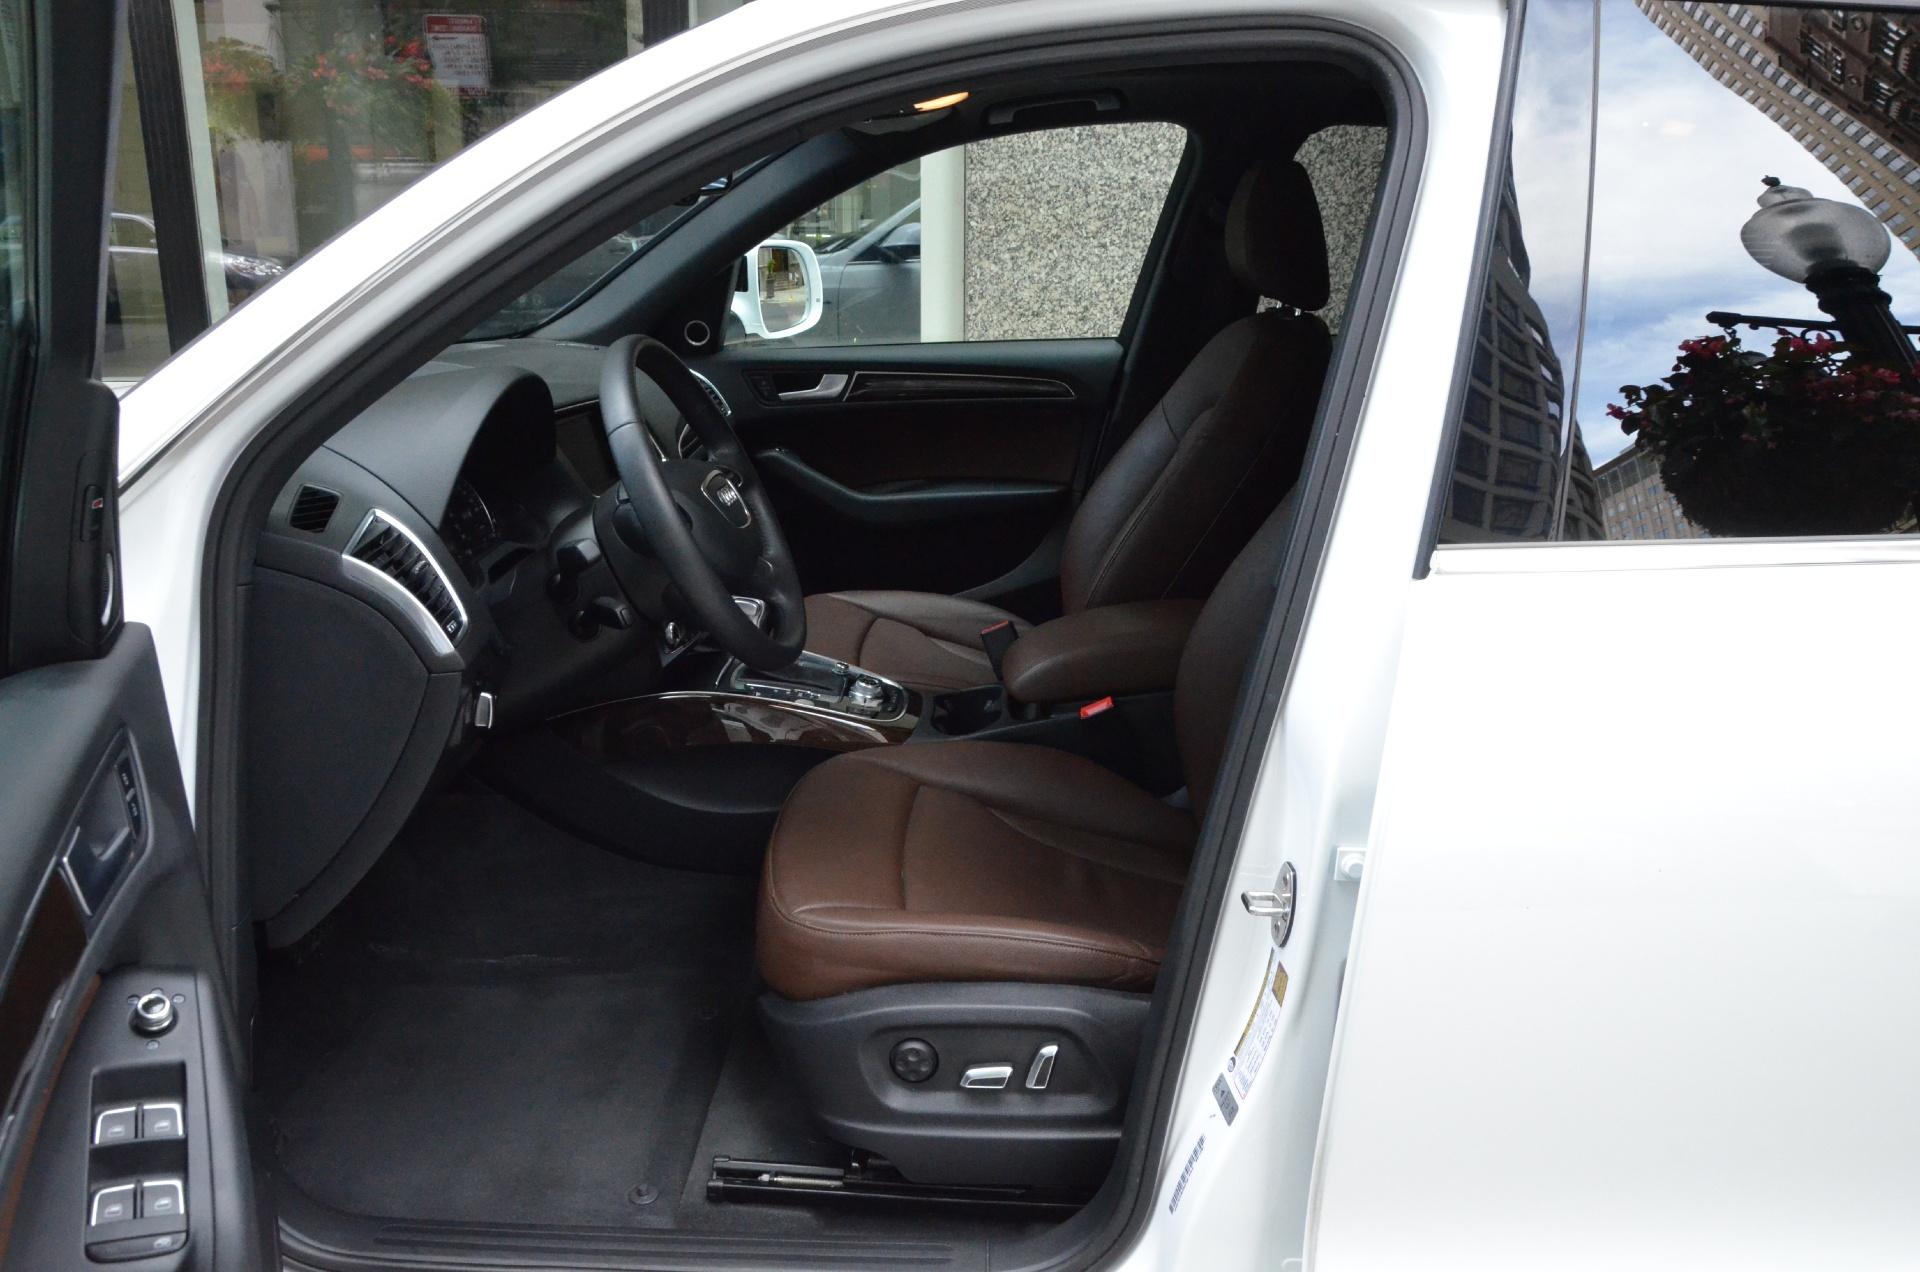 2014 audi q5 3 0t quattro premium plus stock b696ba for sale near. Cars Review. Best American Auto & Cars Review